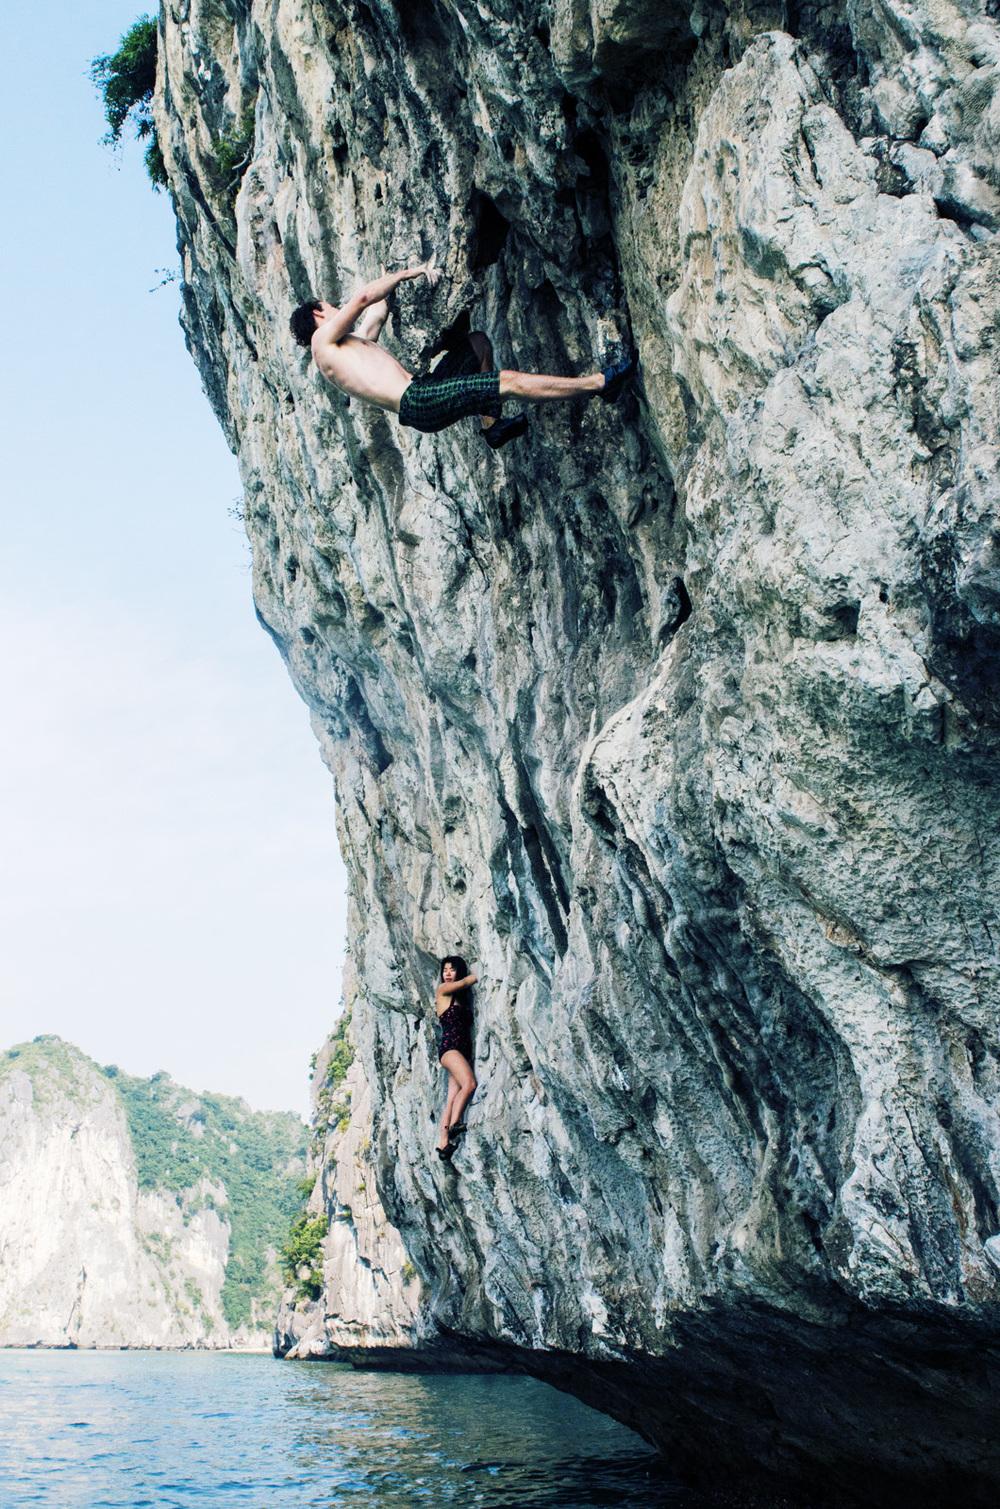 RockClimbing-AsiaOutdoors-HalongBay-Vietnam-21.jpg